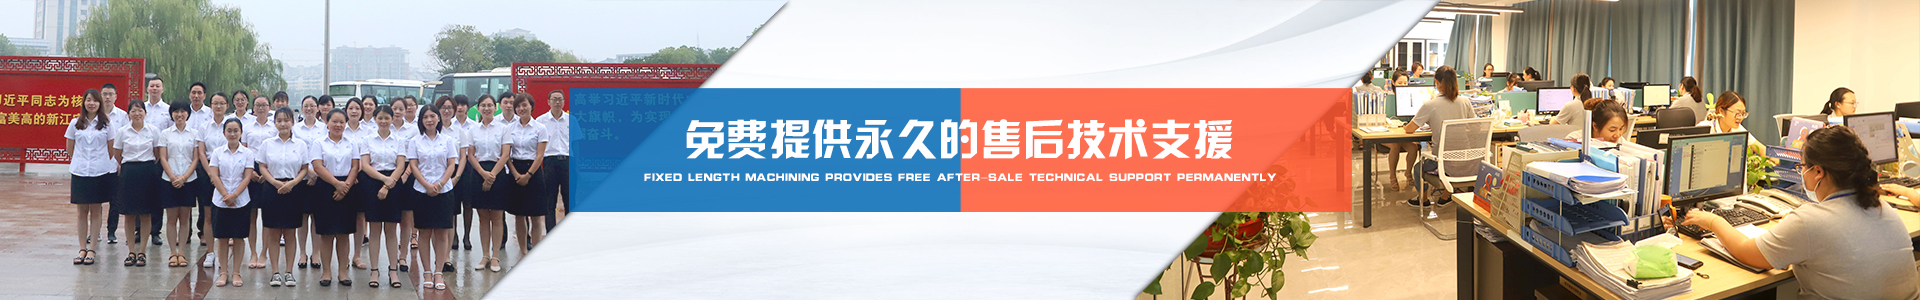 banner图(3)